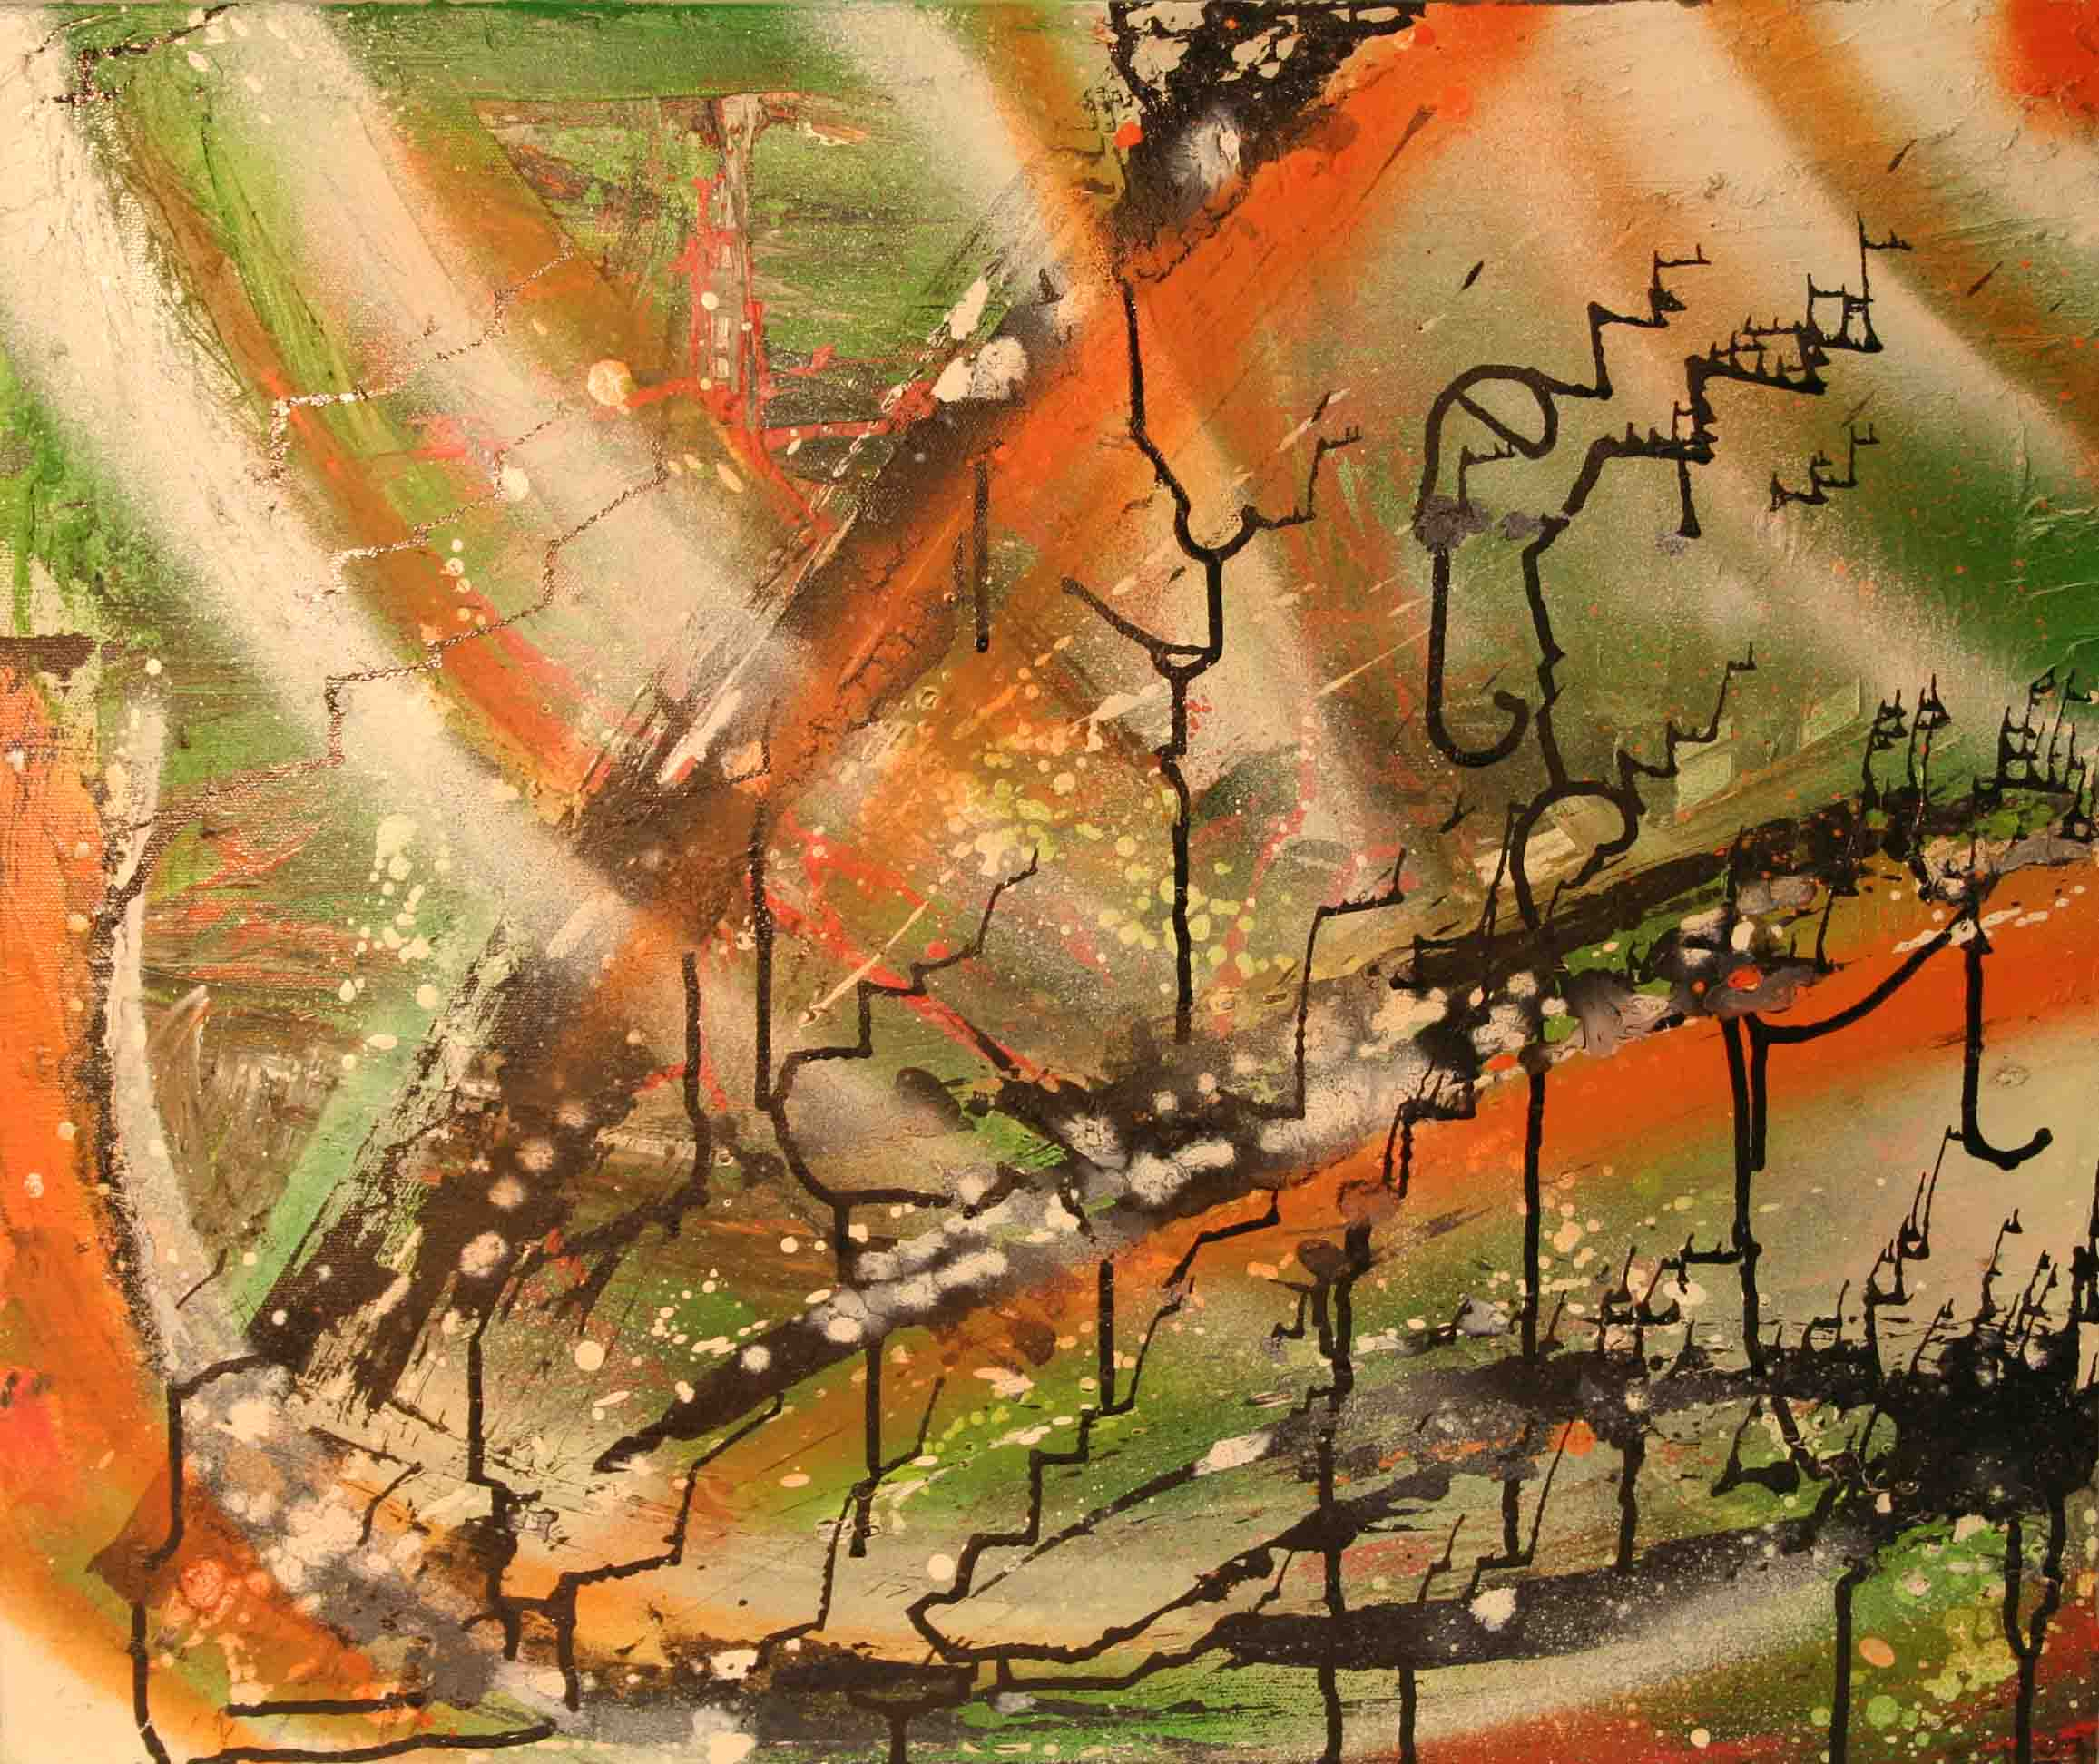 tableau abstrait foret enfantine en orange vert et noir